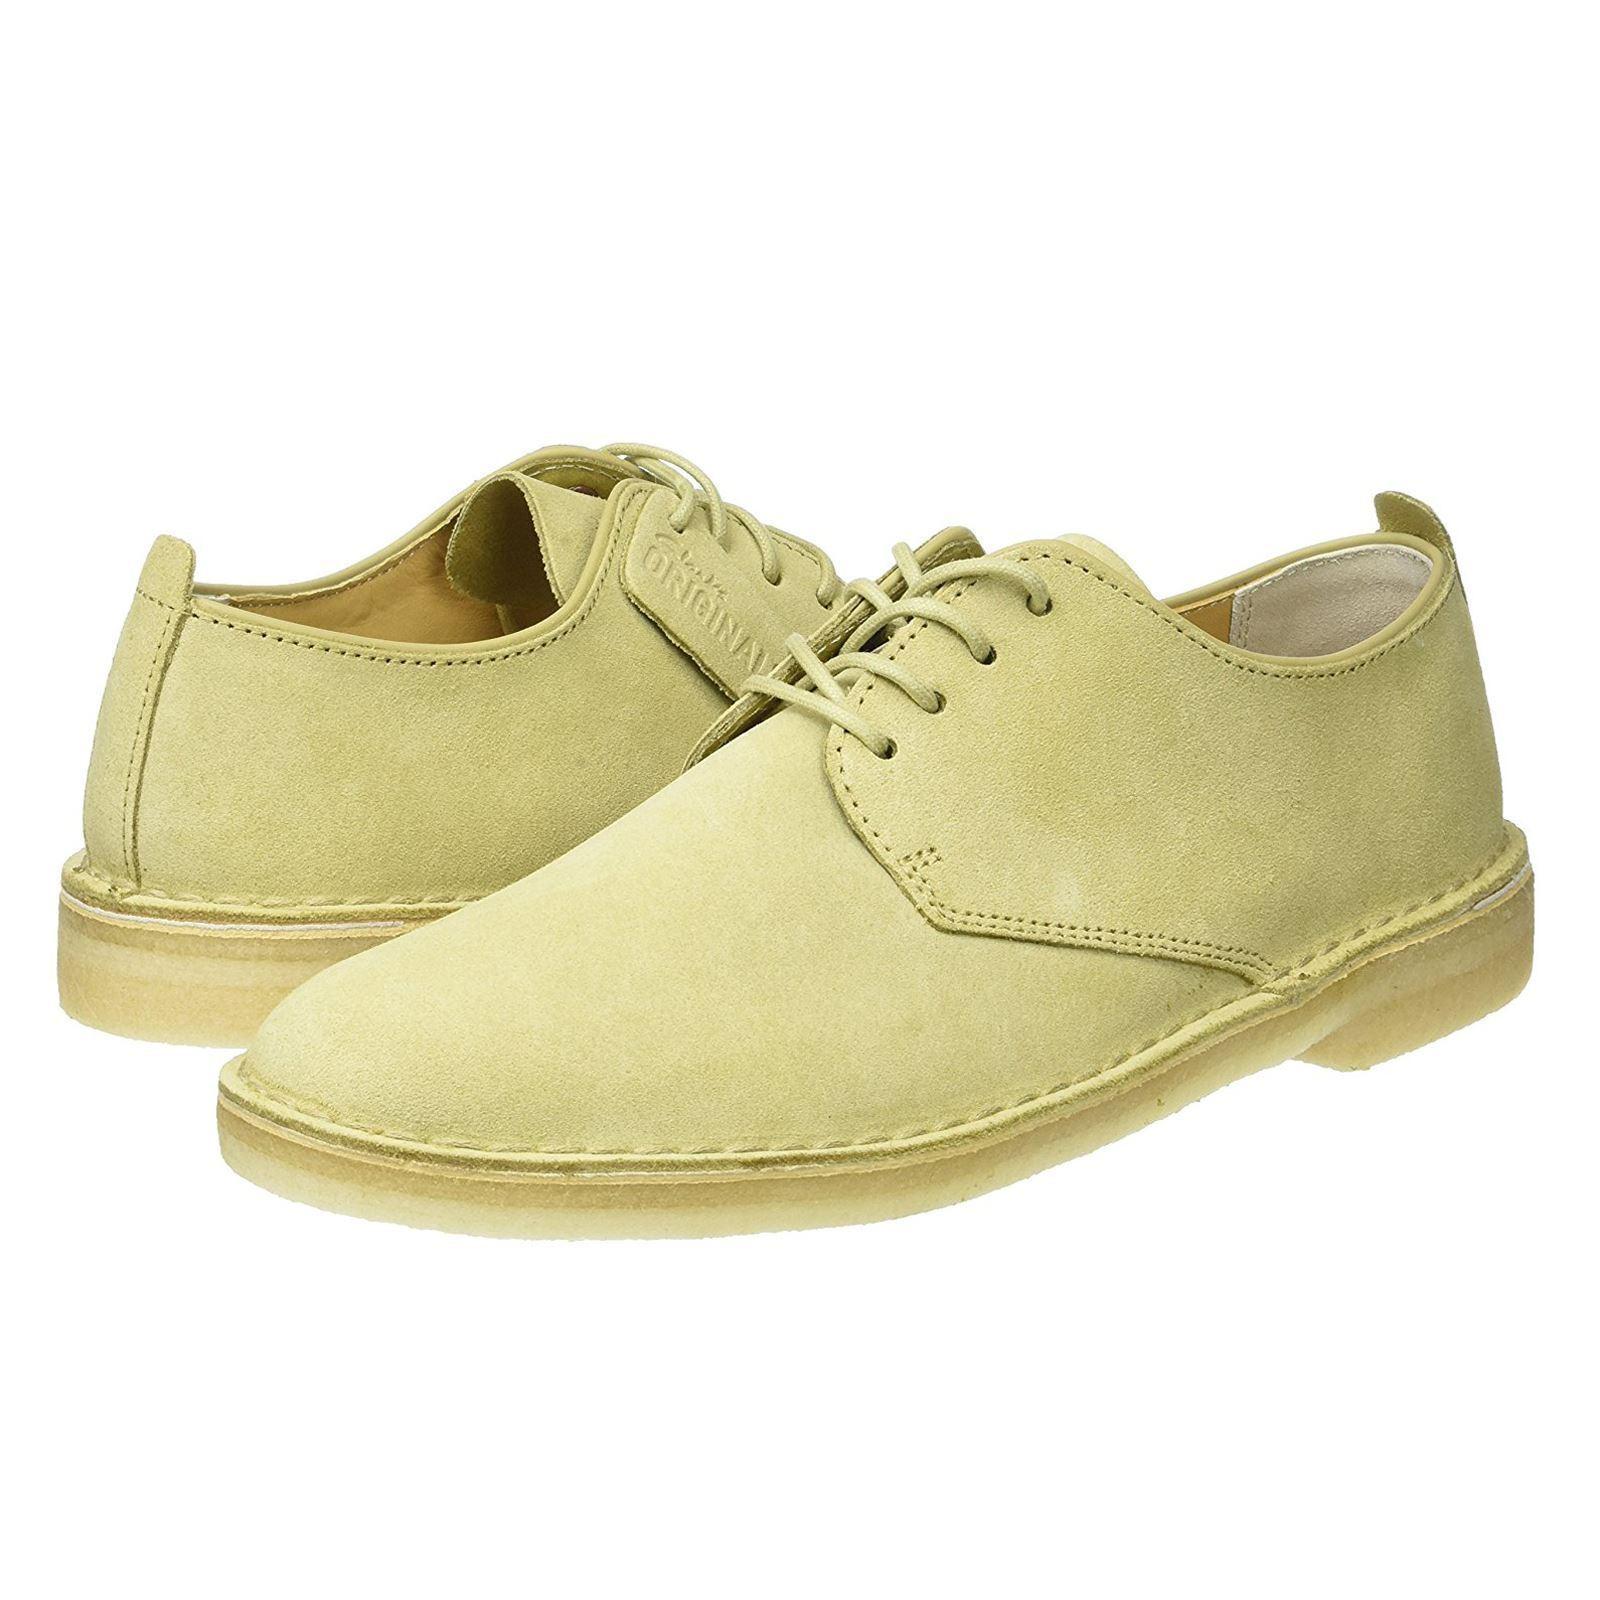 Clarks Originals Da Uomo Desert London Maple Suede Shoes 8,9,10,11